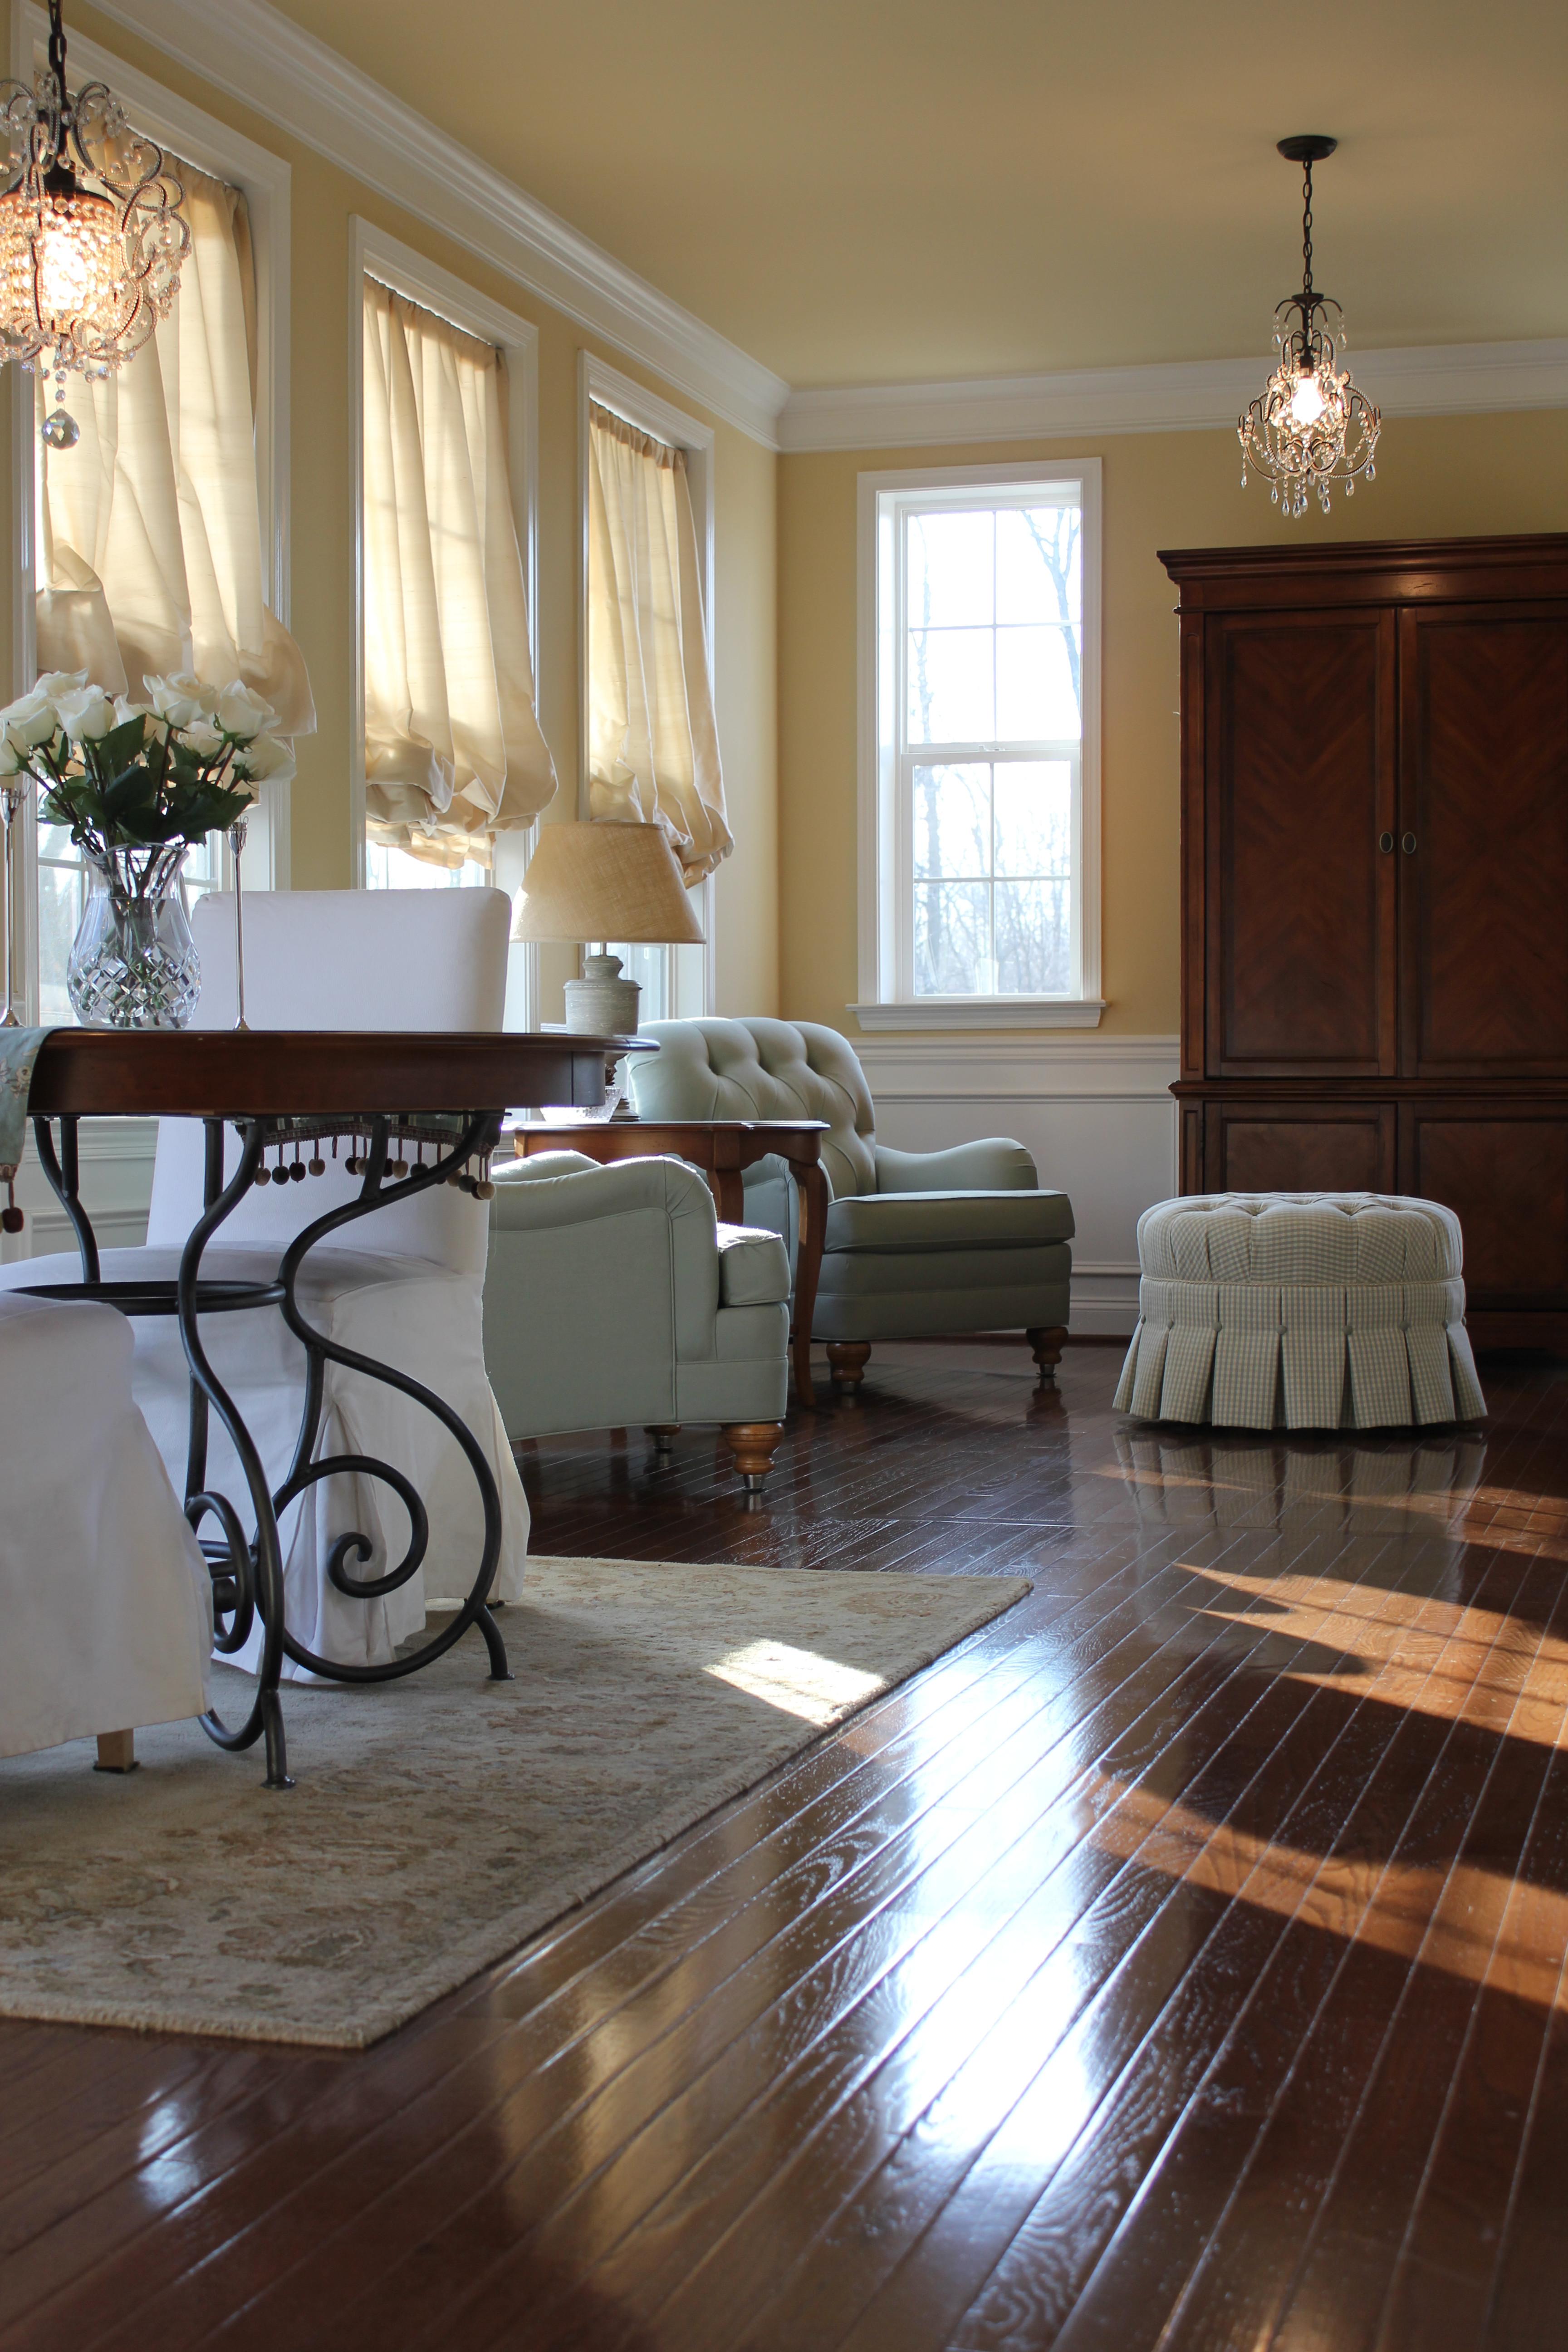 hardwood flooring sq ft price of travertine floor silbury hill regarding i love the hardwood